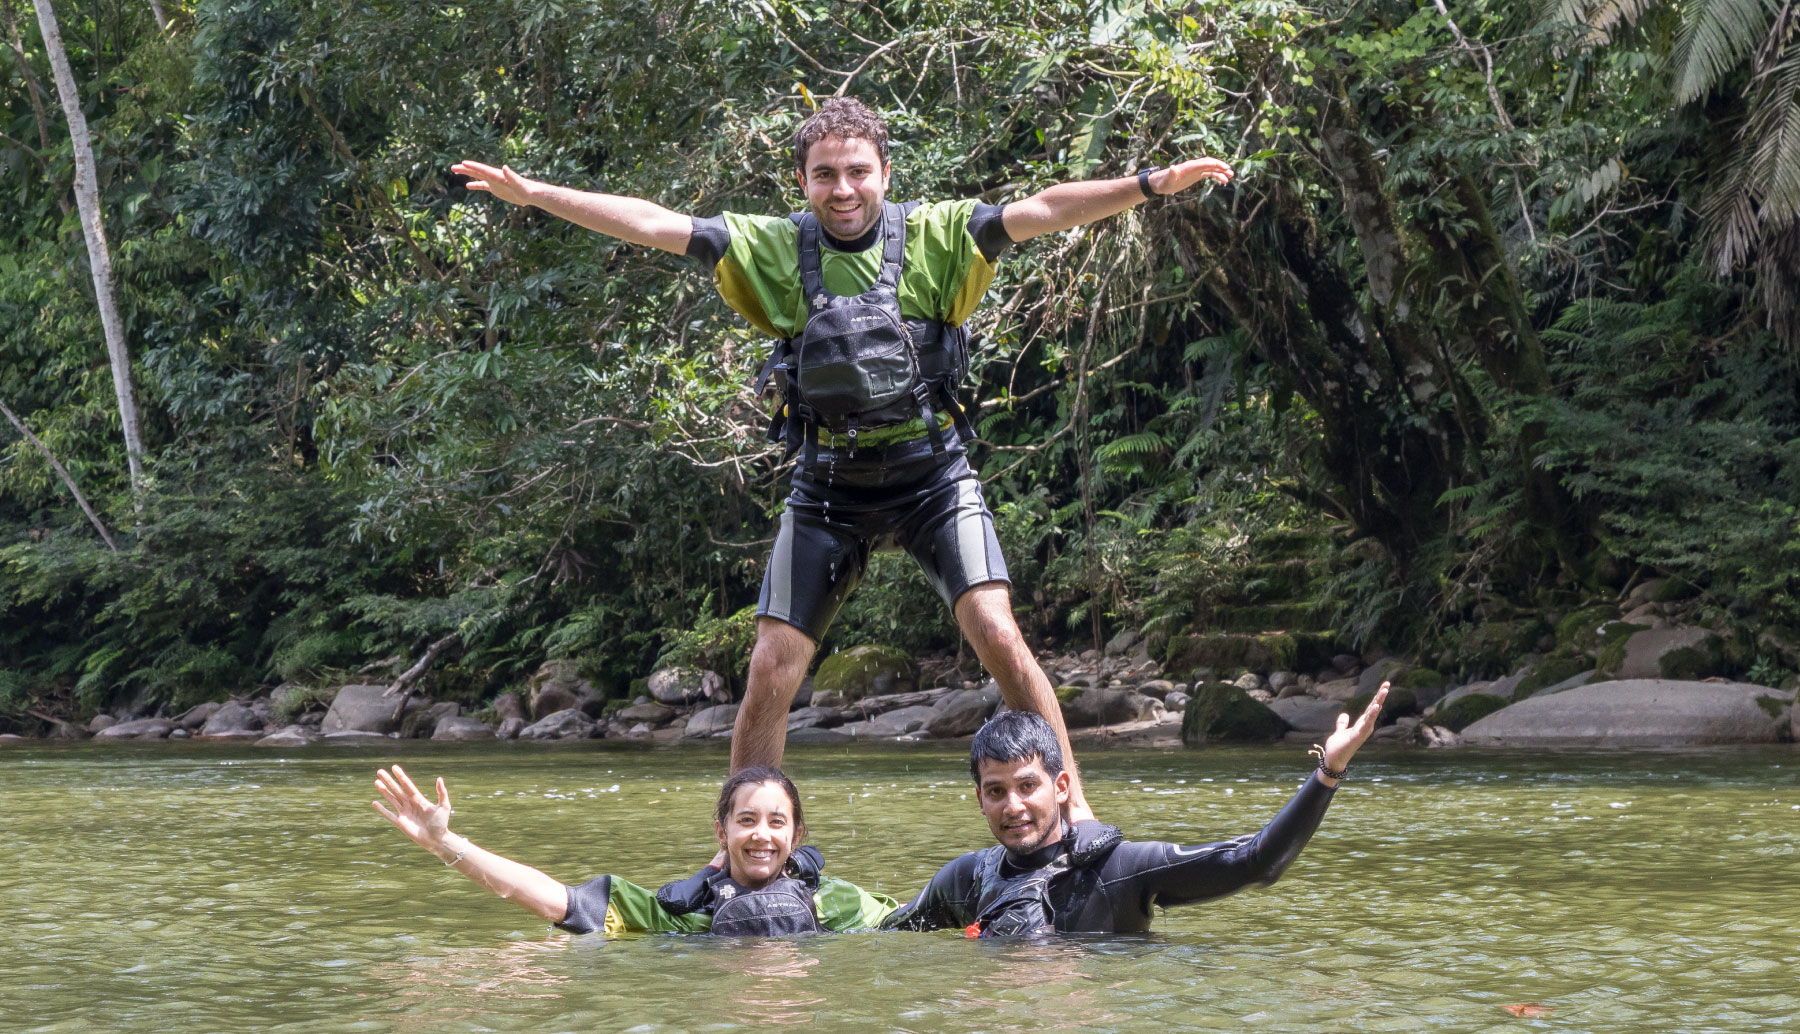 People playing in the Jatunyacu river